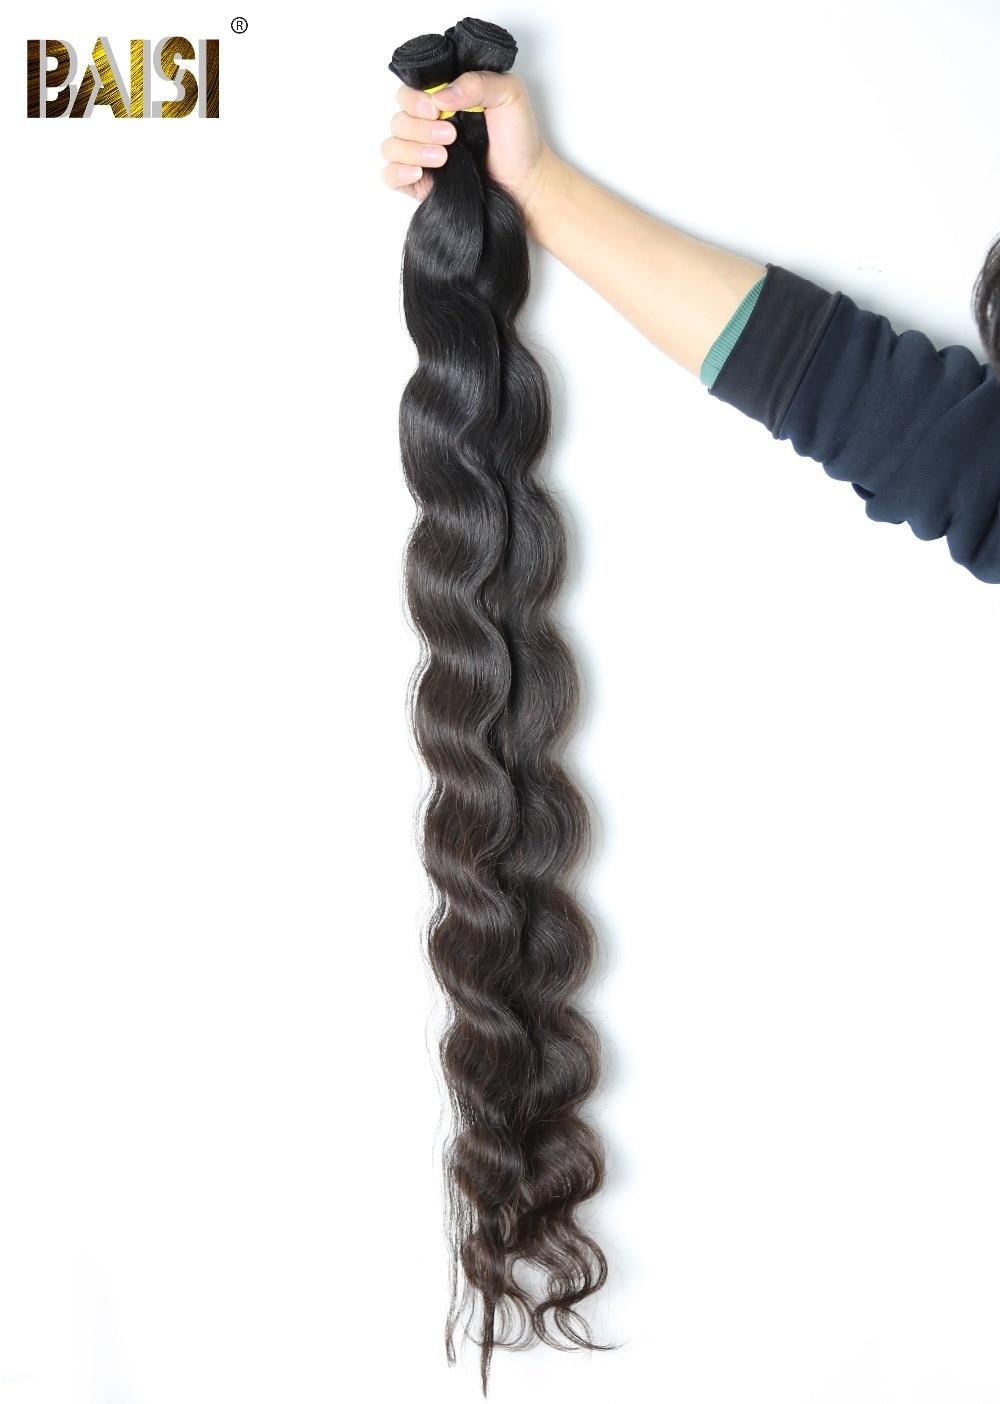 Baisi Factory Peruvian Virgin Hair Body Wave Longest Length 28 30 32 34 36 384042 Human Hair Extension Free Shipping